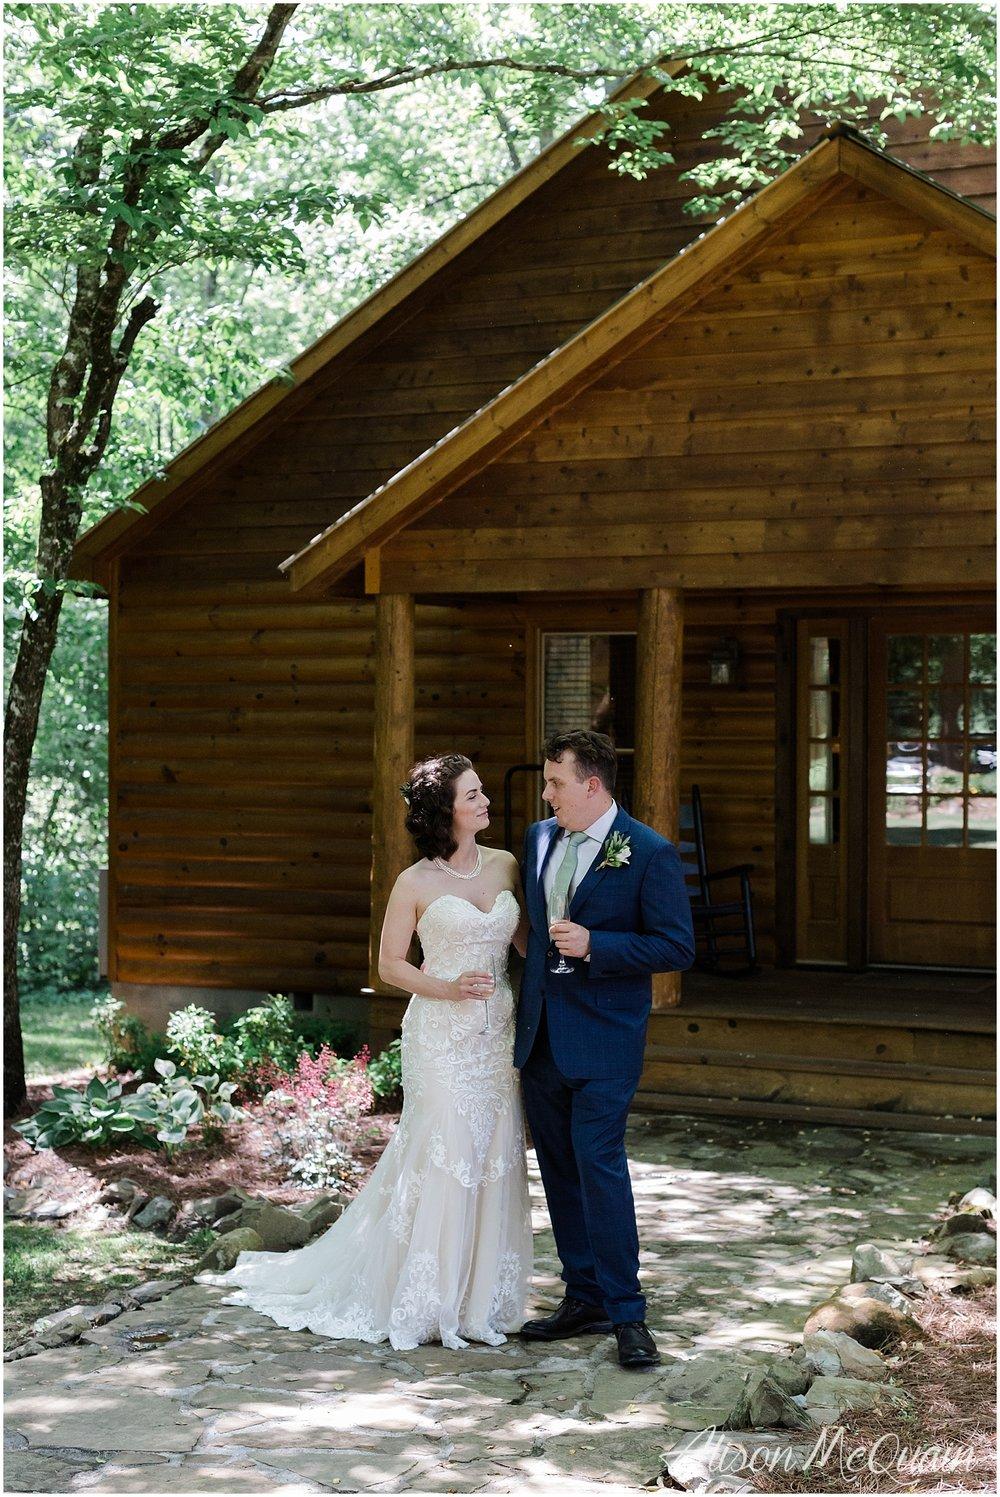 2018-05-23_0003LandC_wedding_dancingbearlodge_townsend_tn_amp.jpg